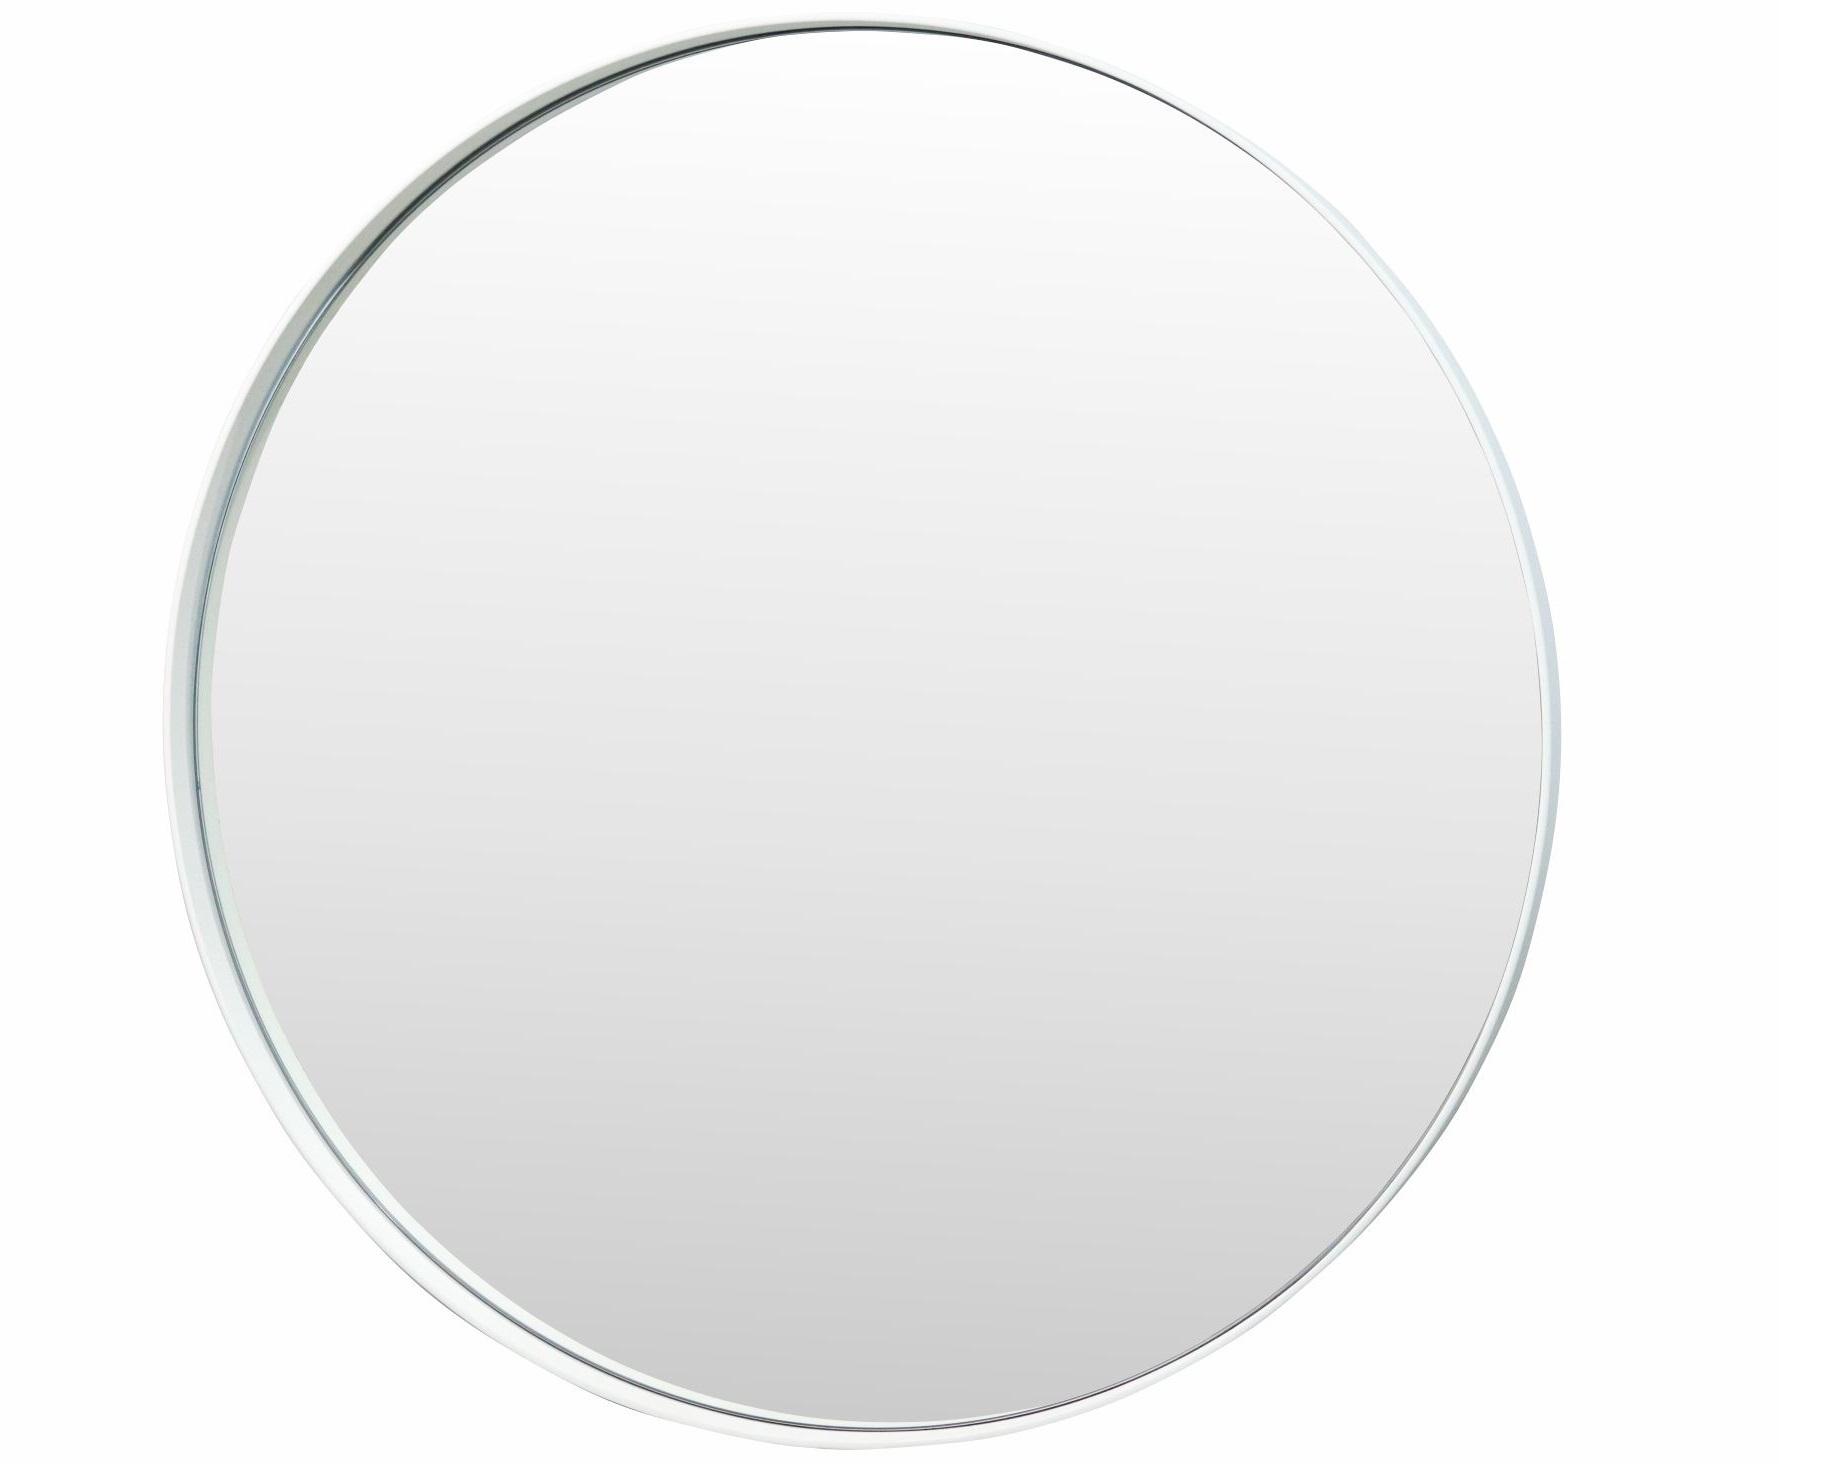 Настенное зеркало гала 70*70 (simple mirror) белый 4 см.